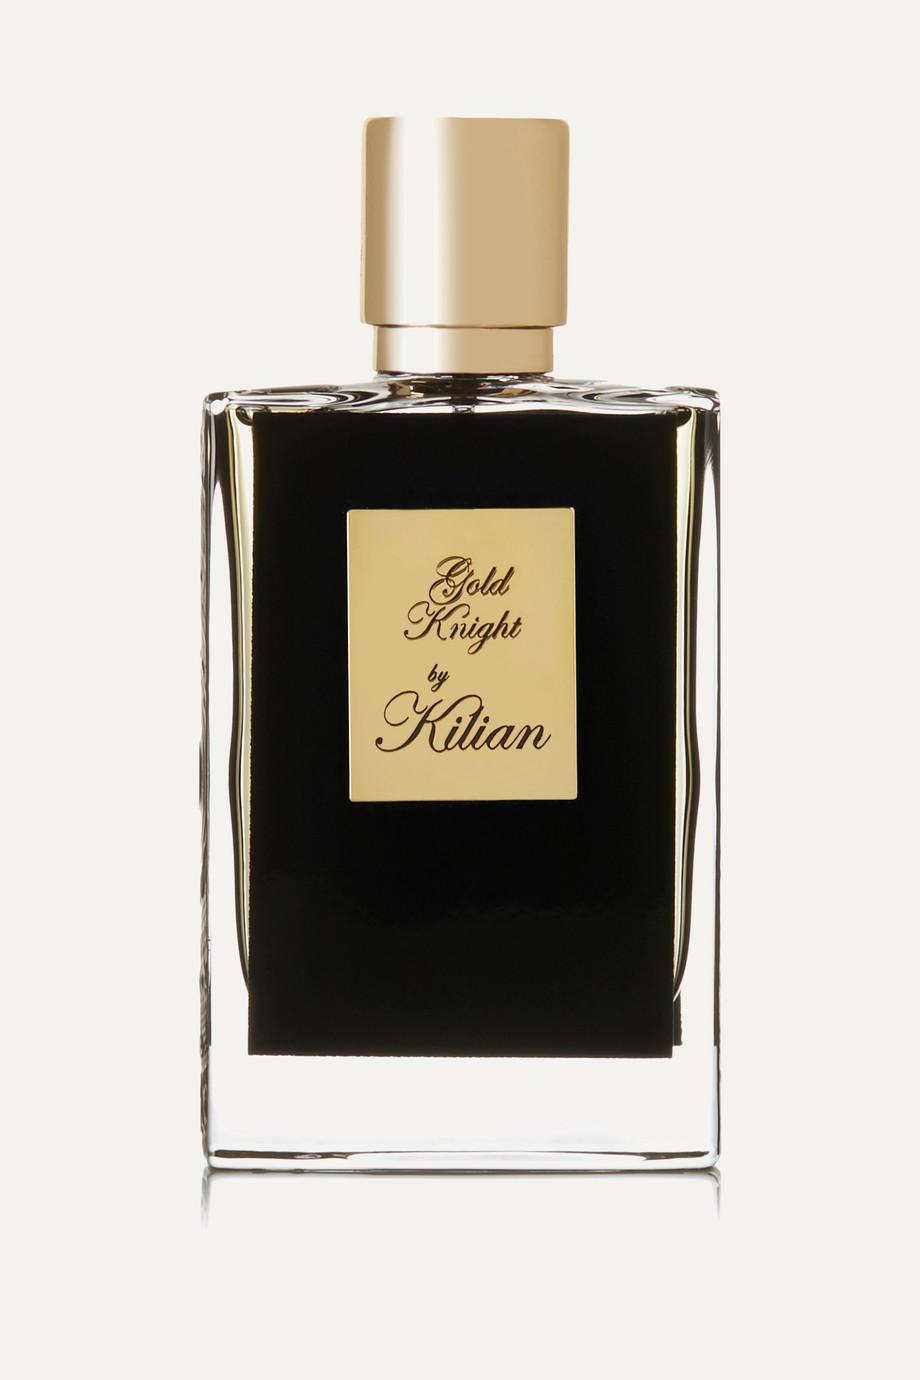 Kilian Gold Knight – Anis & Bergamotte, 50 ml – Eau de Parfum